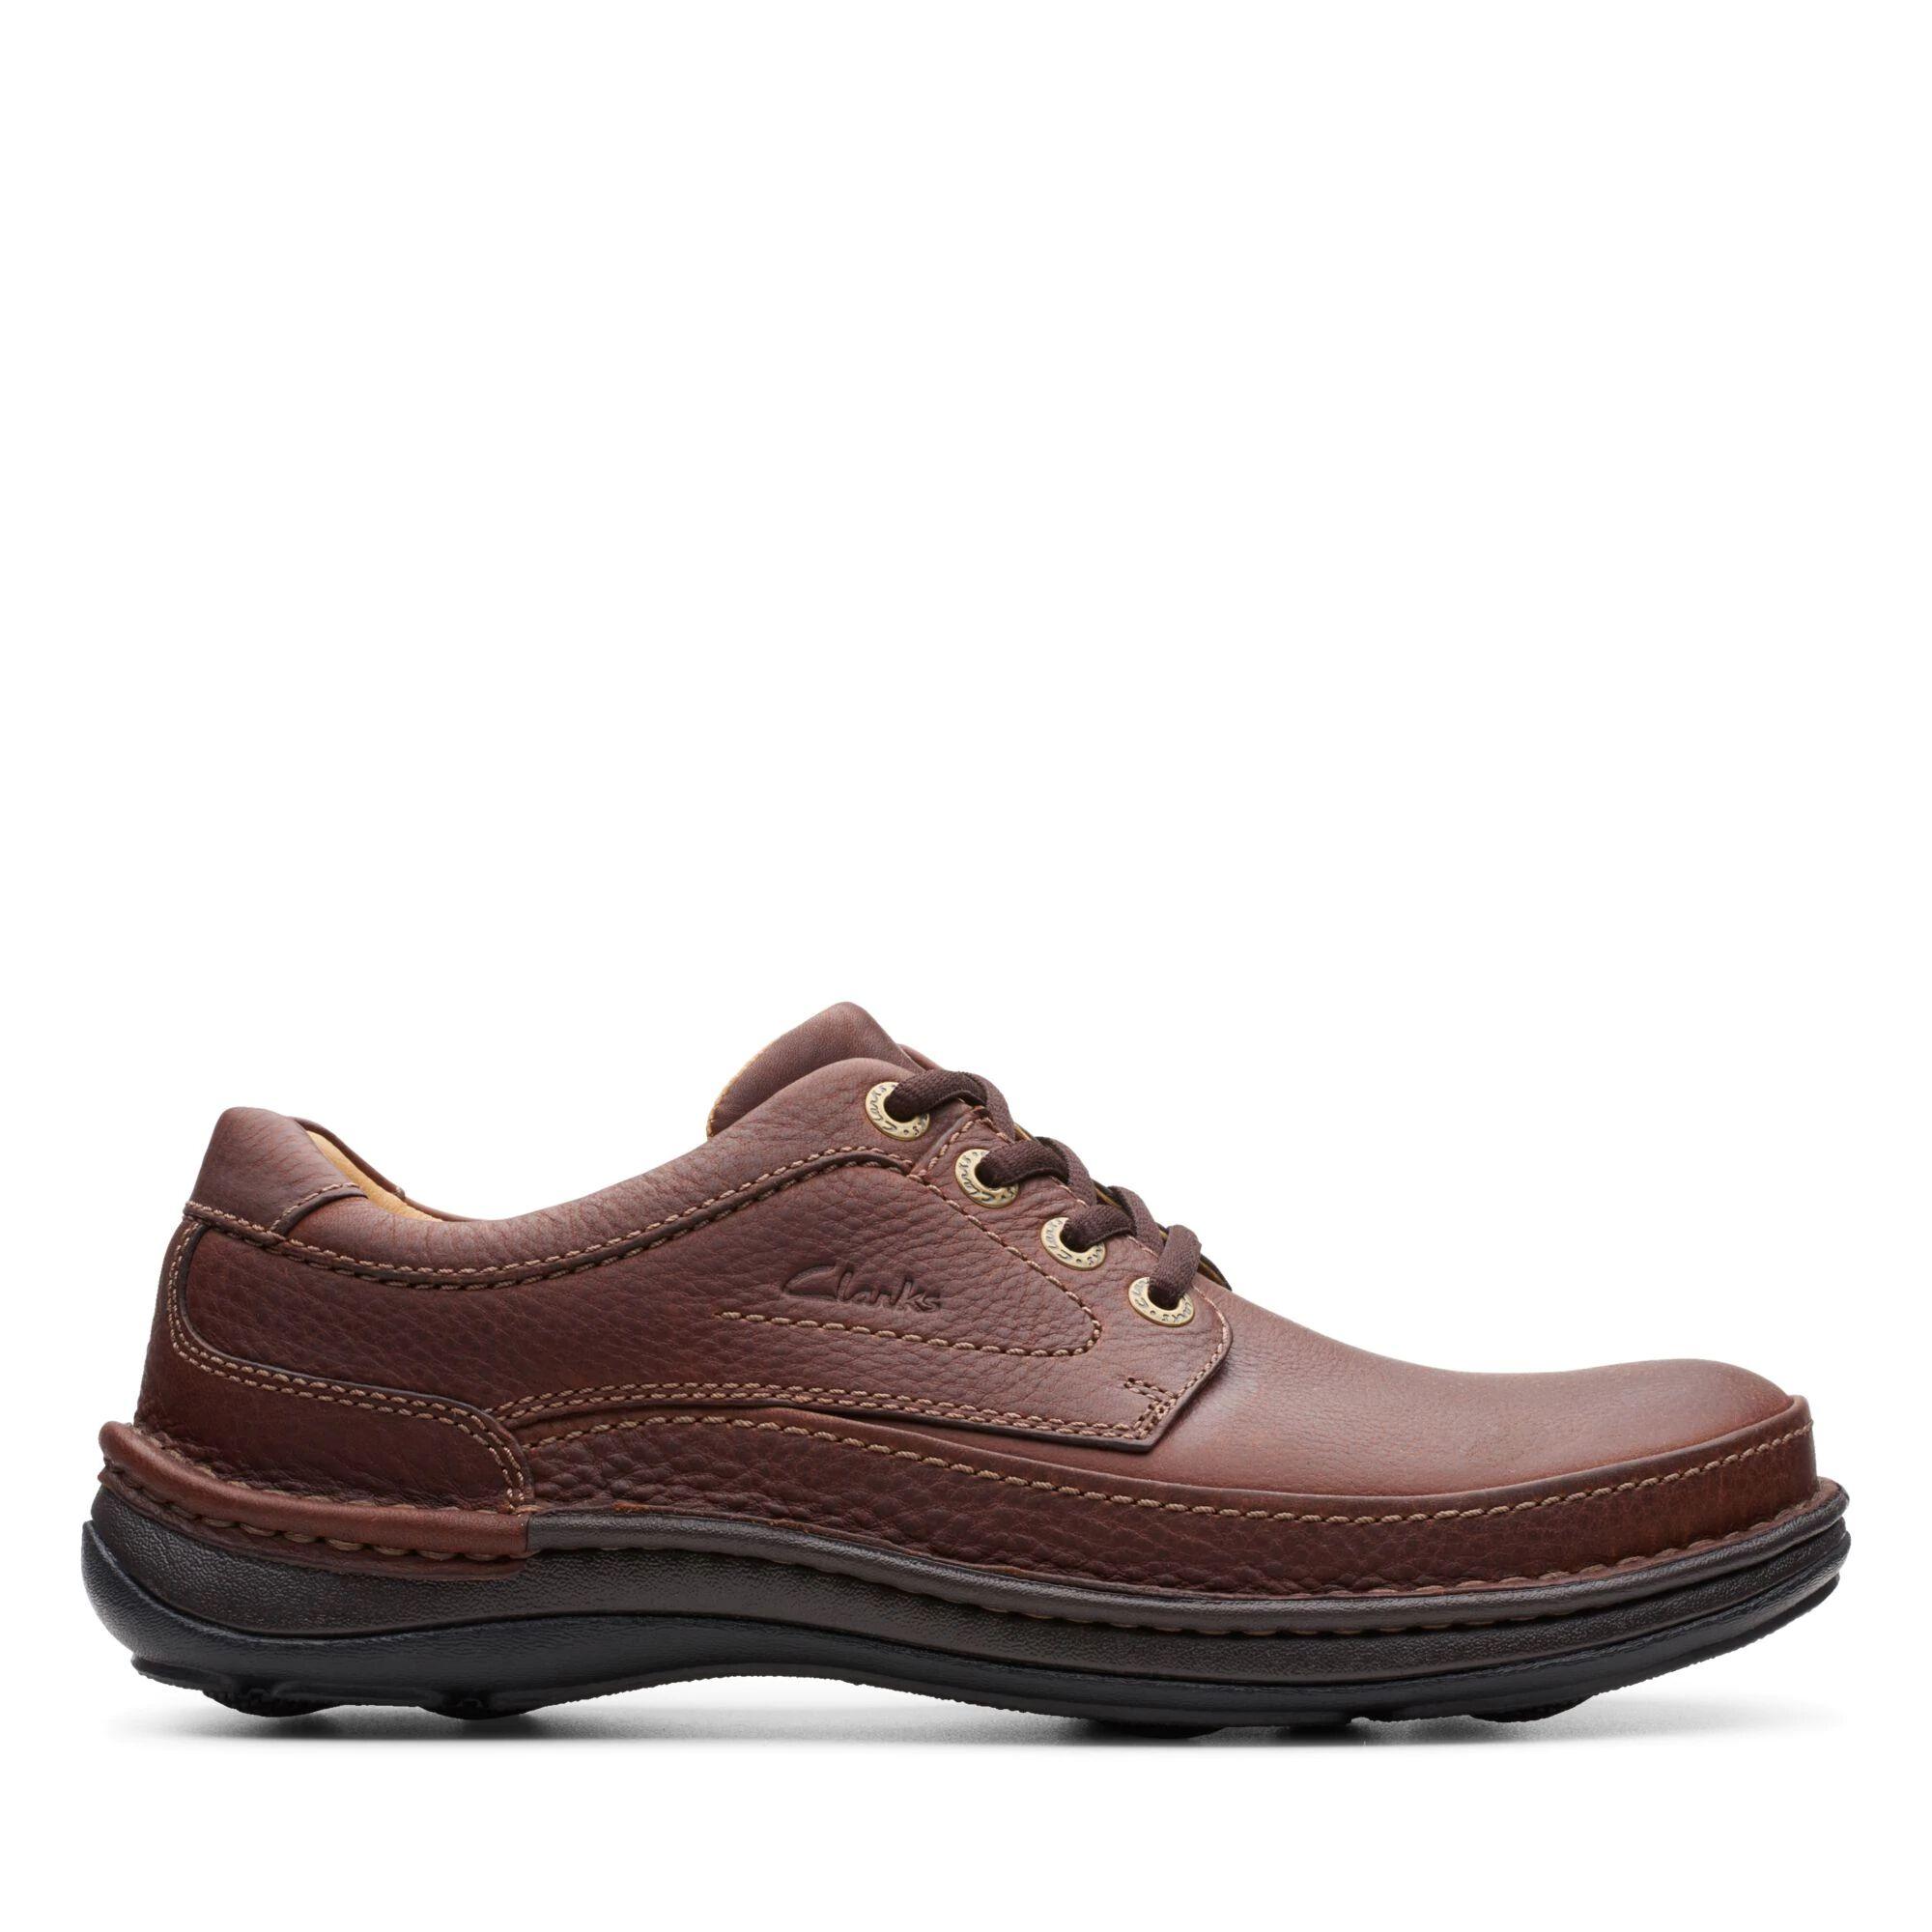 Mahogany Leather Shoes - Nature Three